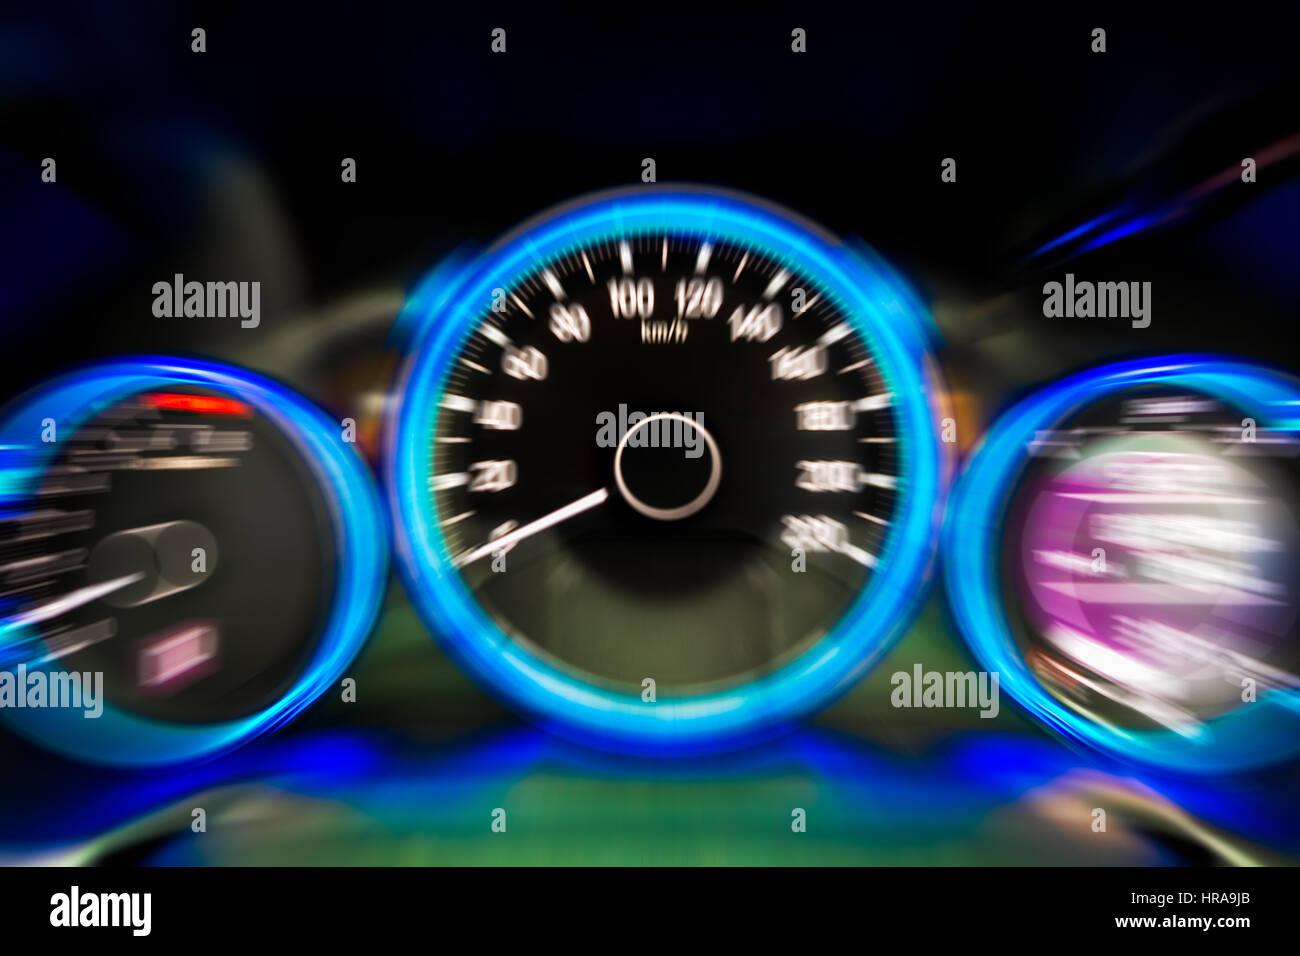 Car Dashboard Modern Automobile Control Illuminated Panel Speed - Car image sign of dashboardcar dashboard sign multifunction display stock photo royalty